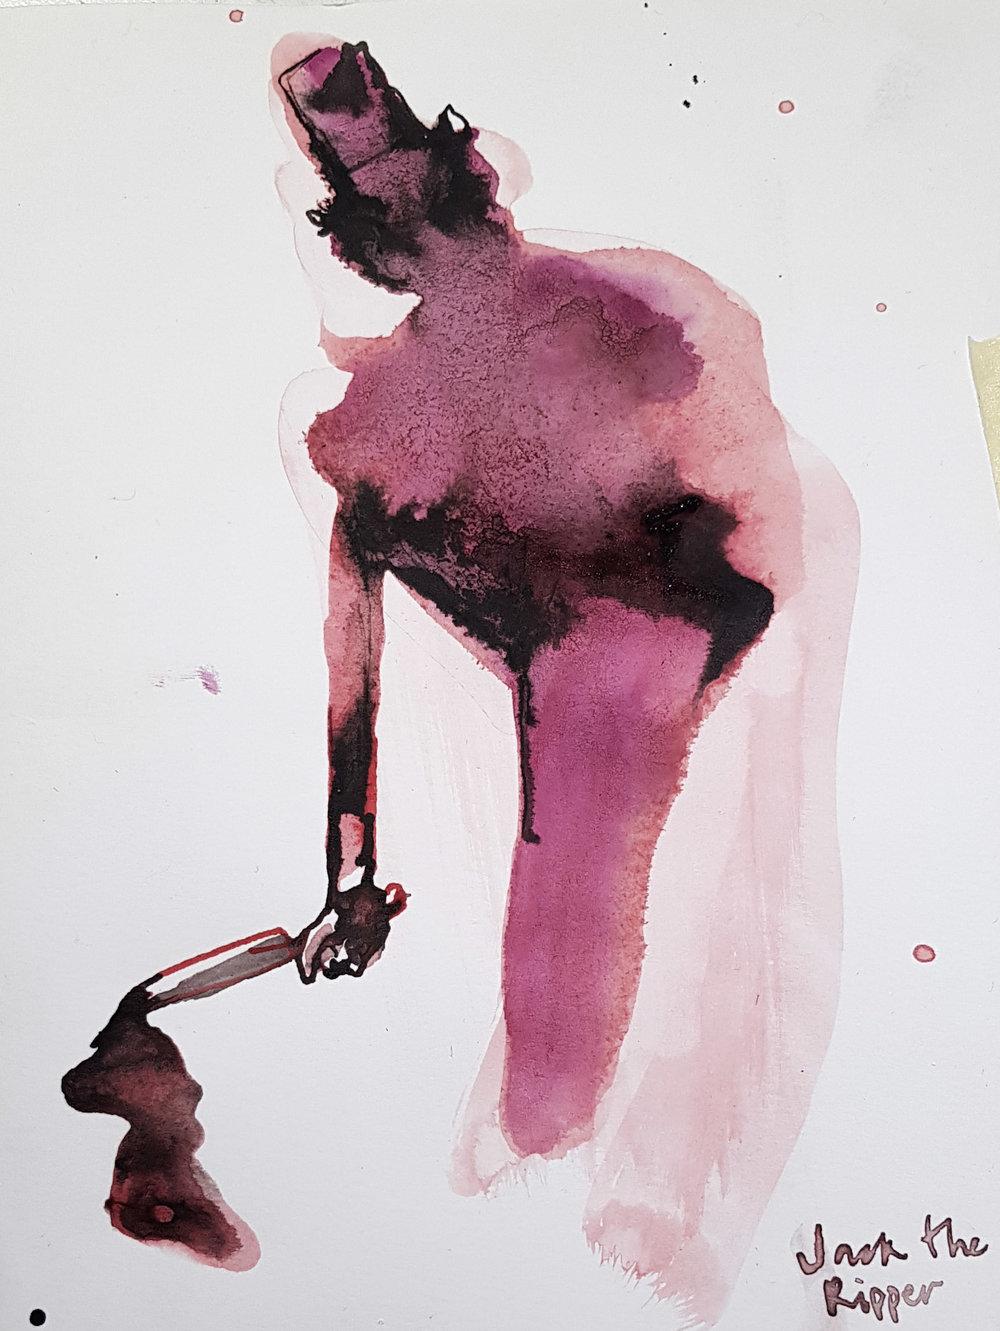 Jack the Ripper - Tusch på papper, 13x20 cm500:-